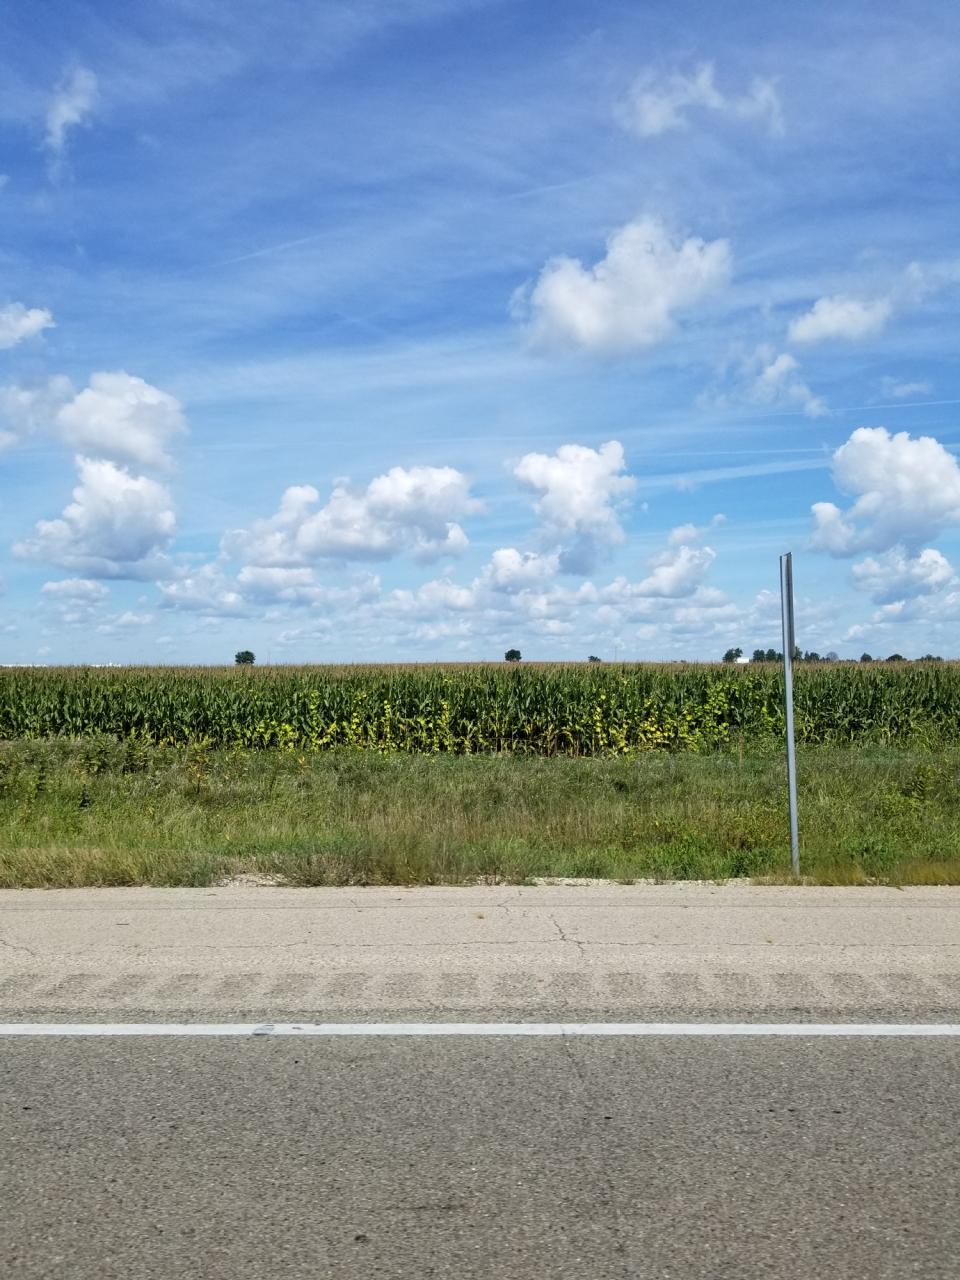 Miles of corn and a big sky in Iowa.